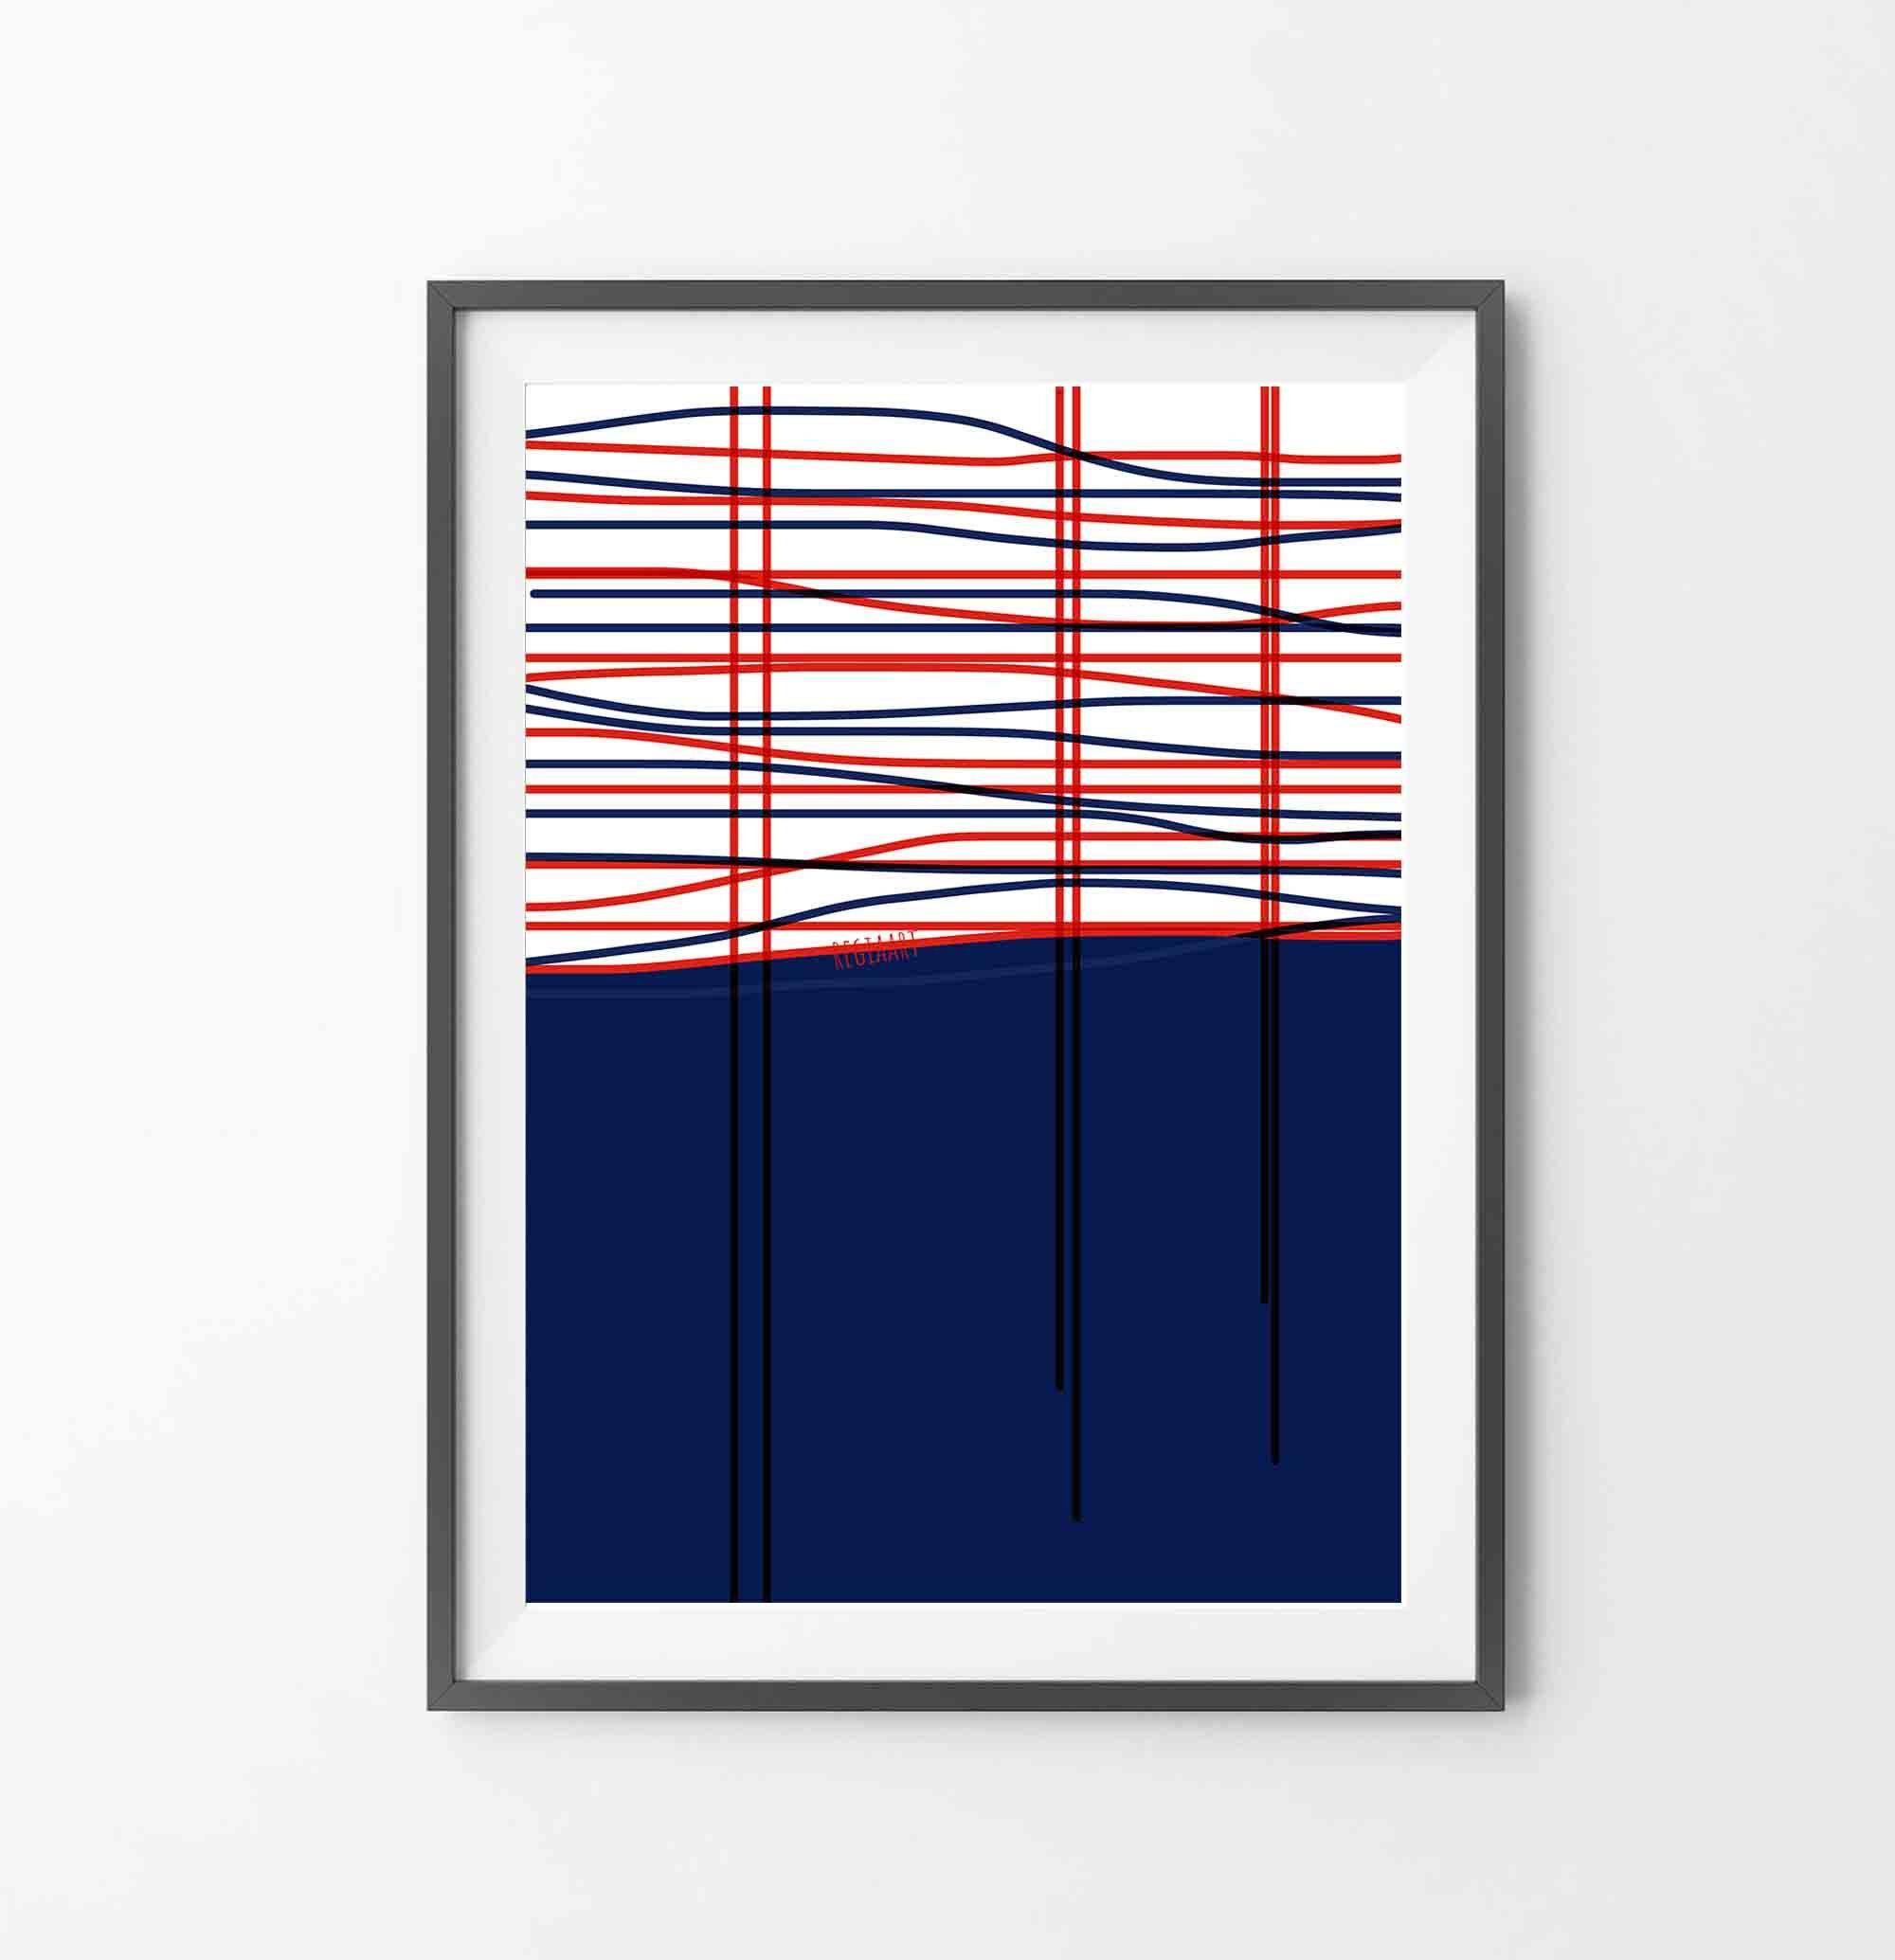 RegiaArt Home Decor Printable Abstract Art Geometric Art Digital Drawing Line Art Print Red Blue Line Wall Art Instant Download